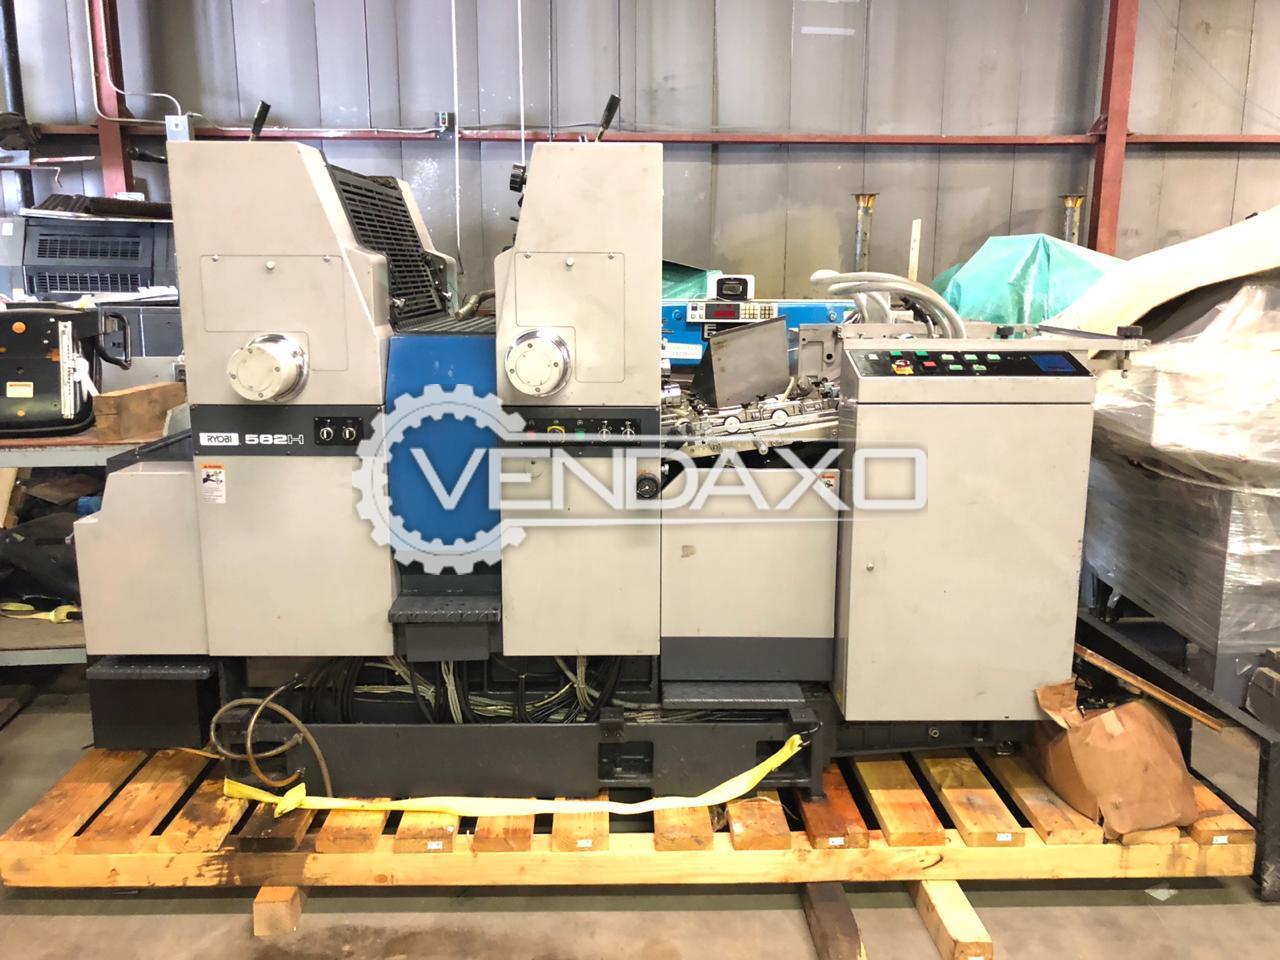 Ryobi 582H Offset Printing Machine - 18 X 23 Inch, 2 Color